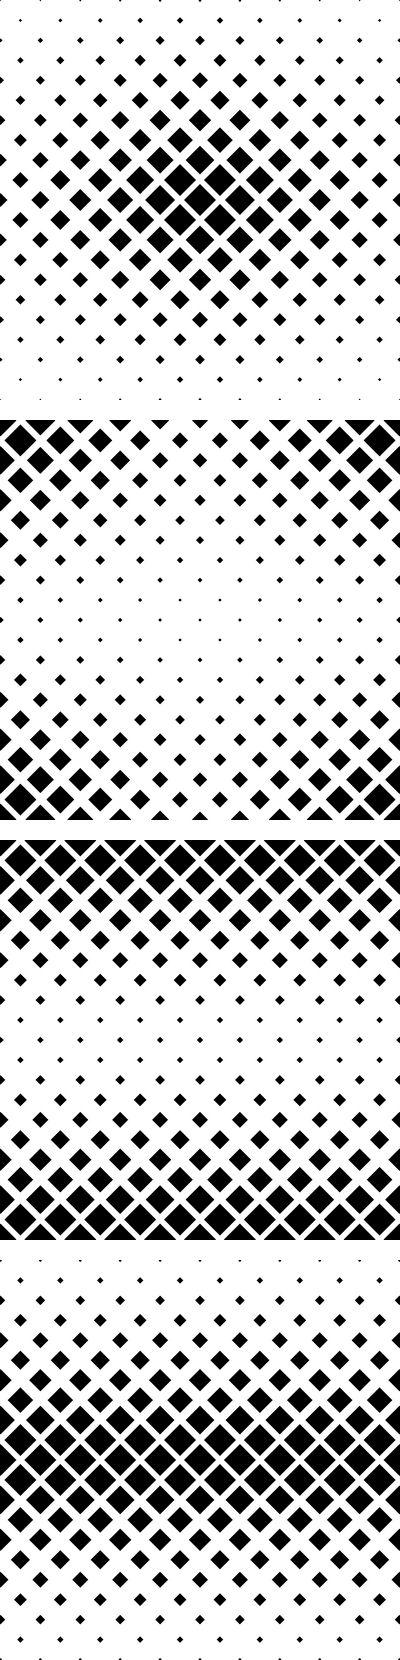 Simple seamless monochrome square patterns http://www.shutterstock.com/g/davidzydd/sets/6284589-seamless-monochrome-patterns?rid=2051861